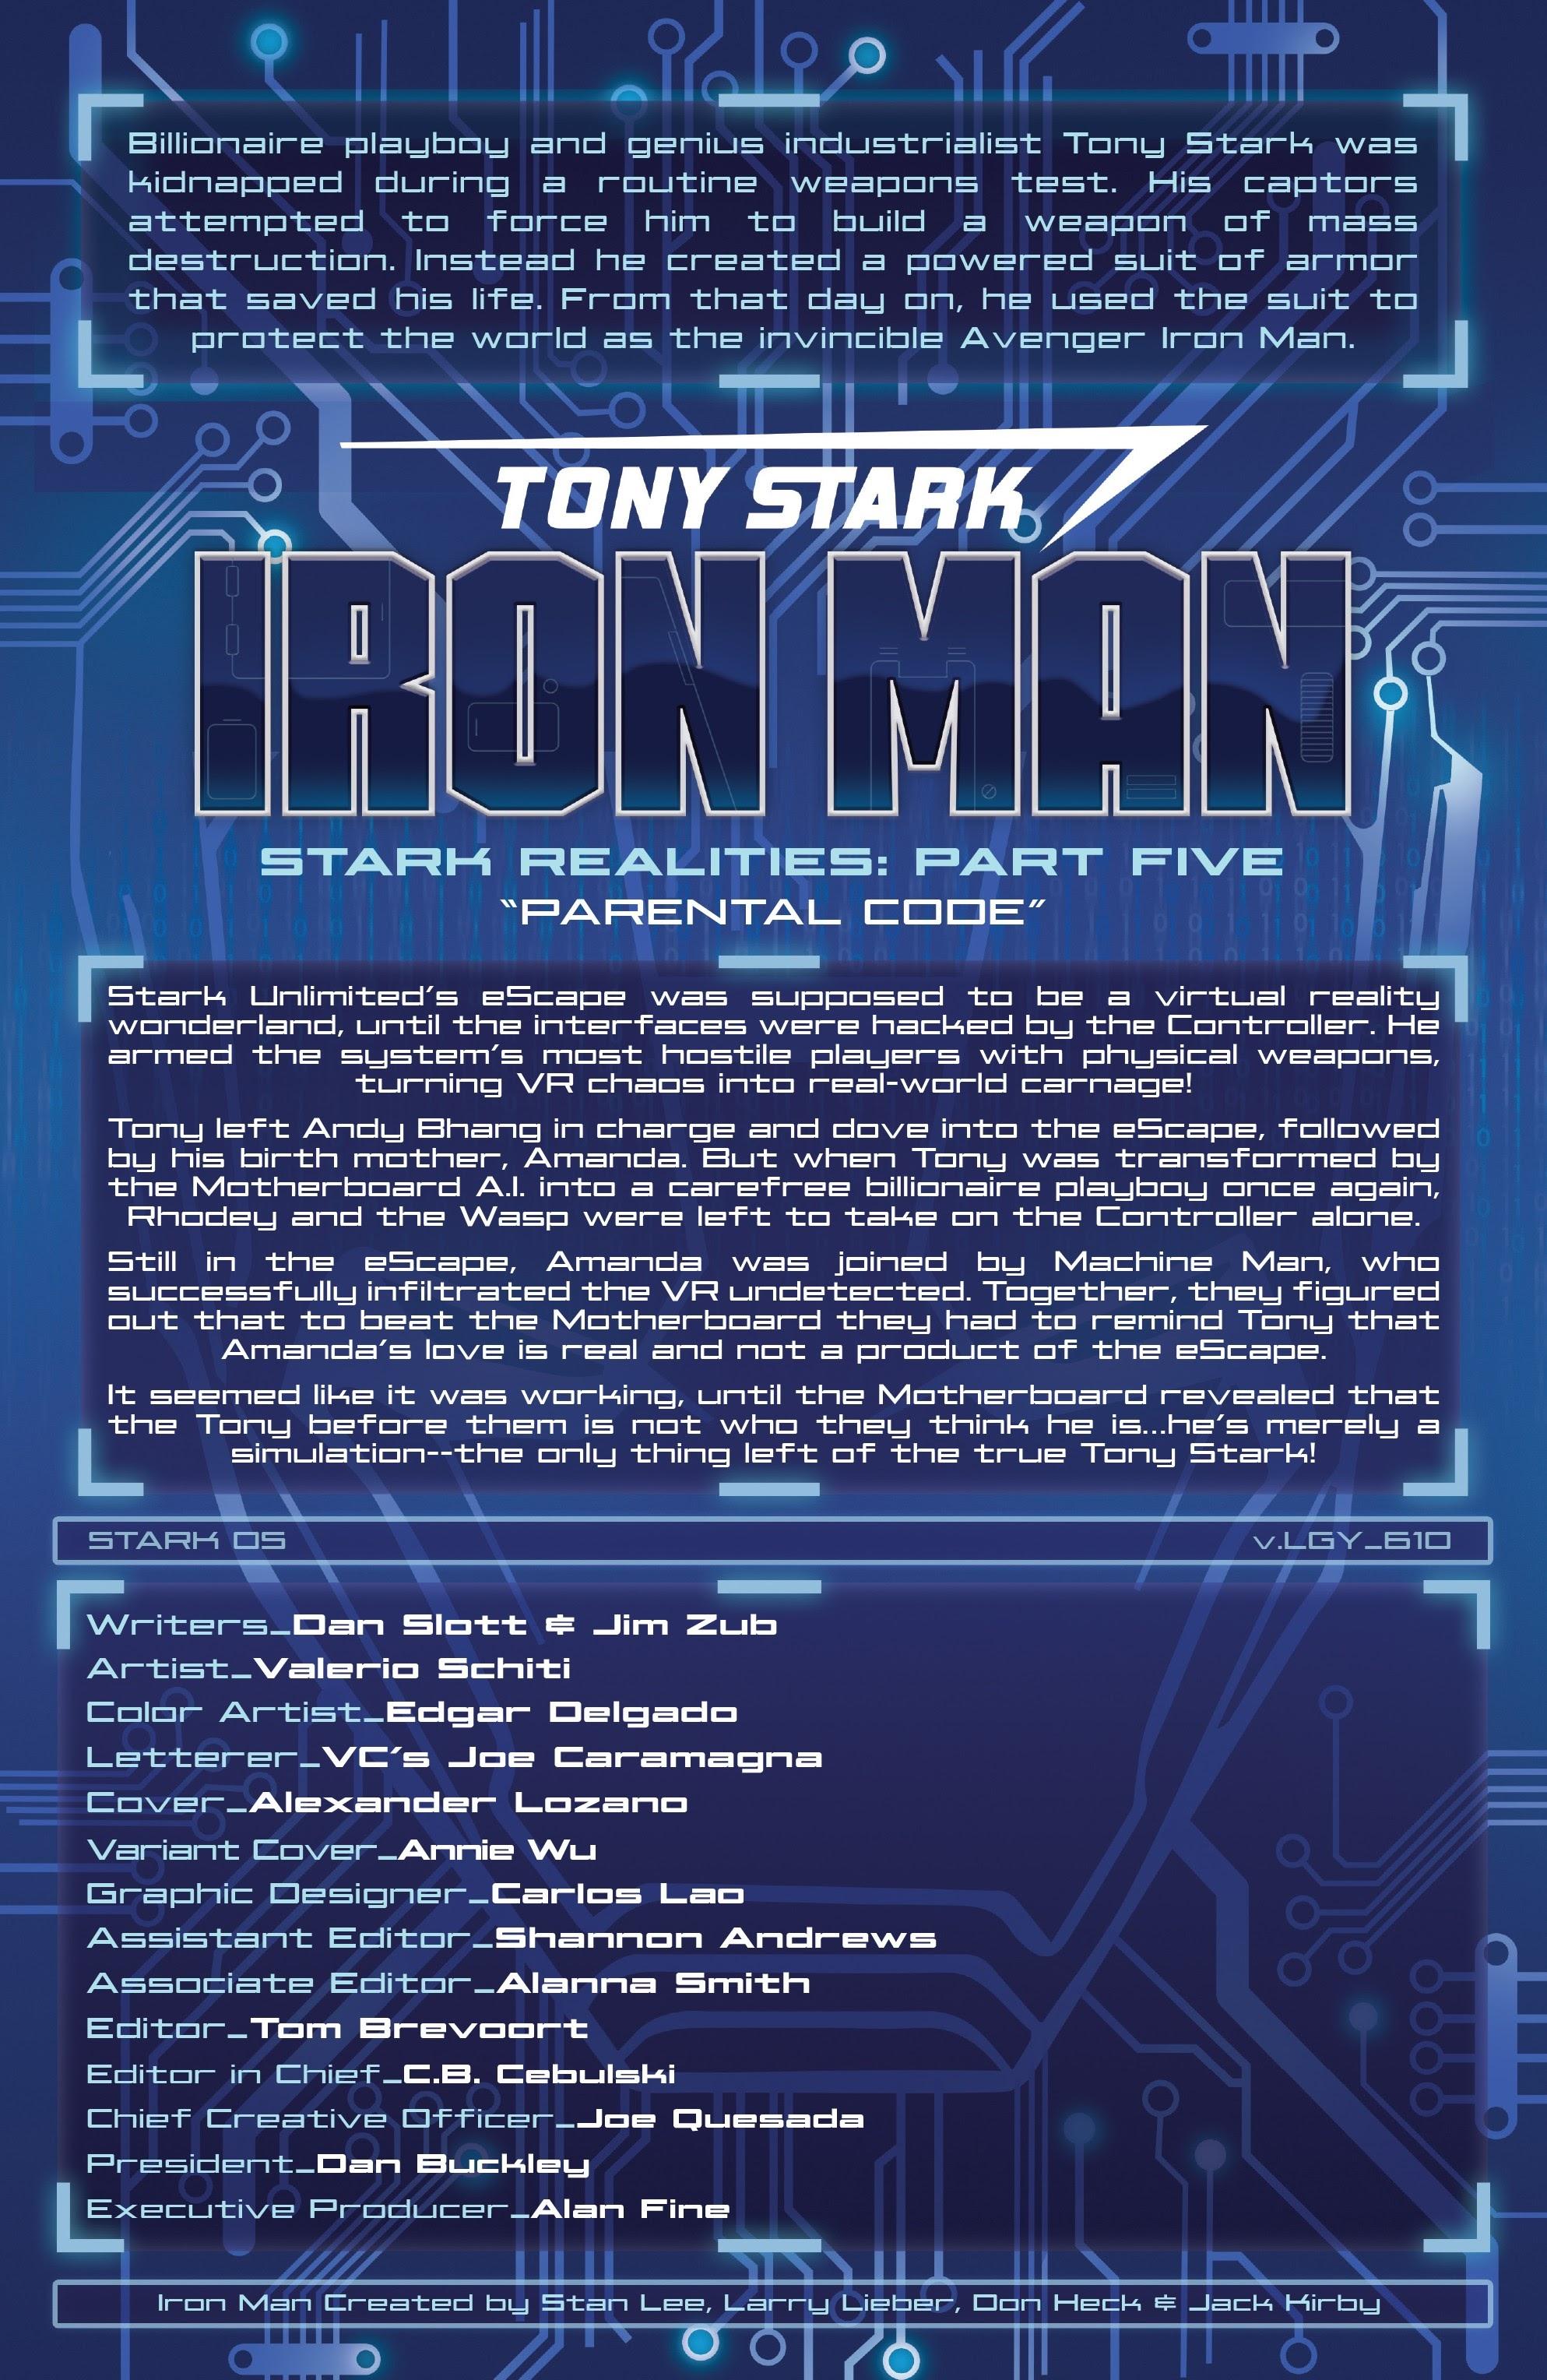 Read online Tony Stark: Iron Man comic -  Issue #10 - 2